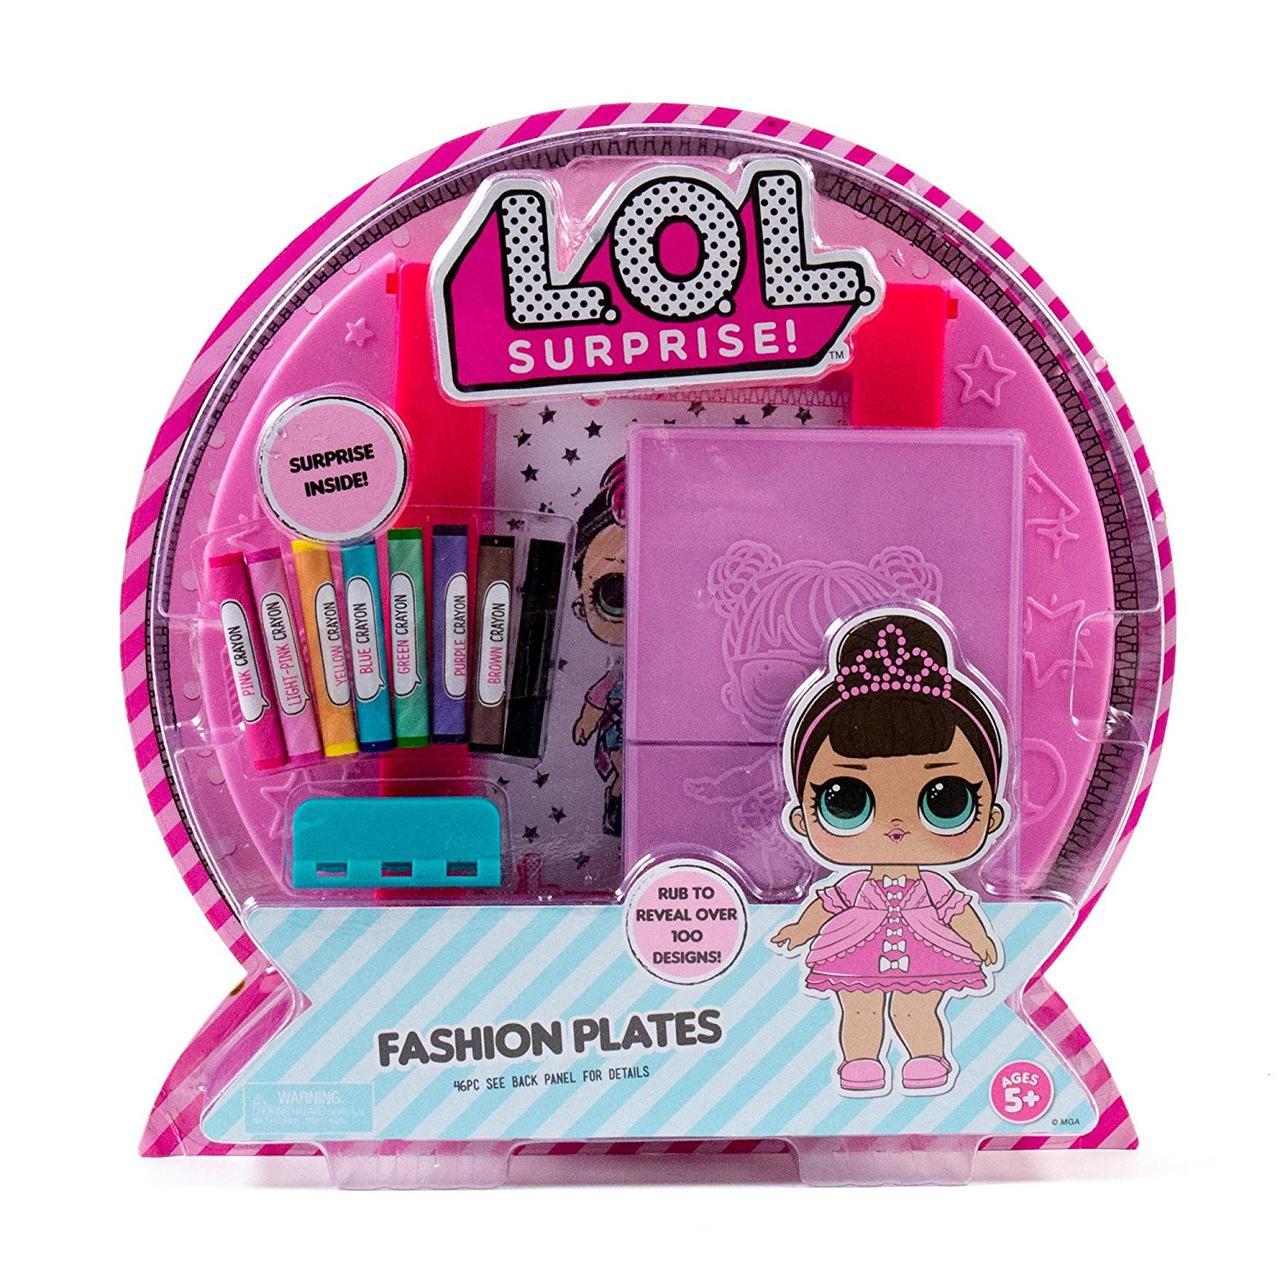 L O L Surprise Fashion Plates модные пластинки раскраски Mga оригинал